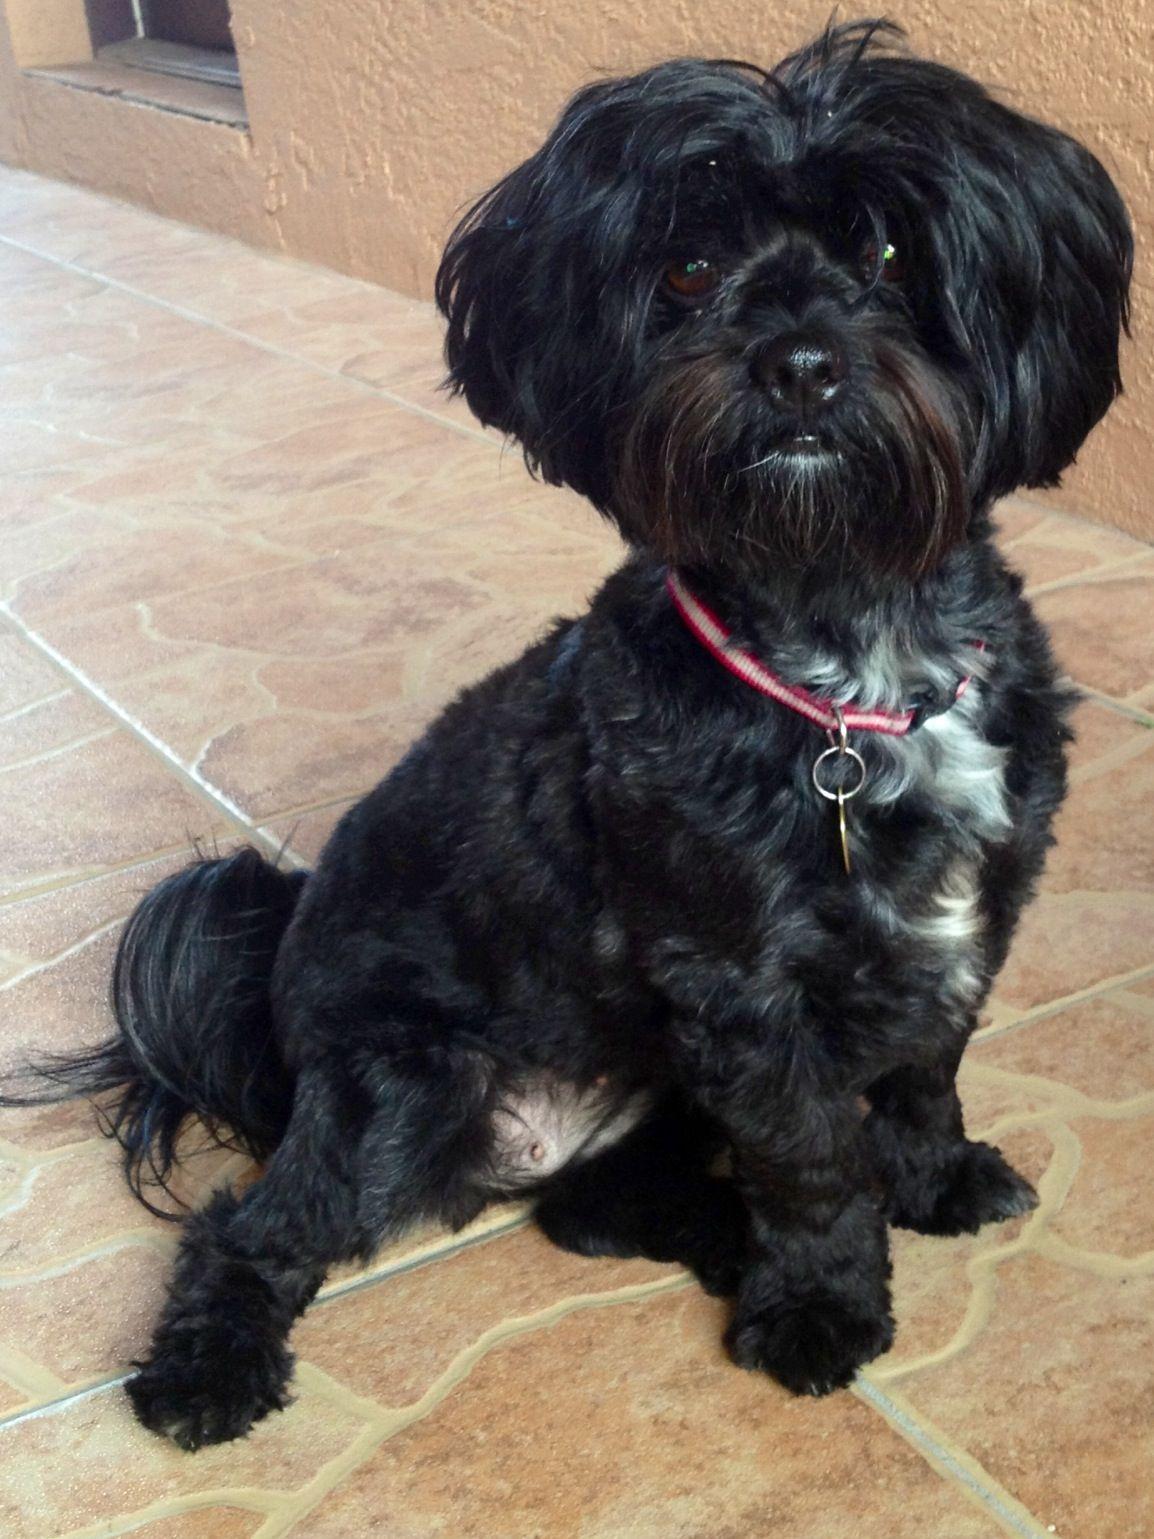 Black Shipoo Poodle Mix Dogs Shitzu Poodle Mix Shitzu Poodle